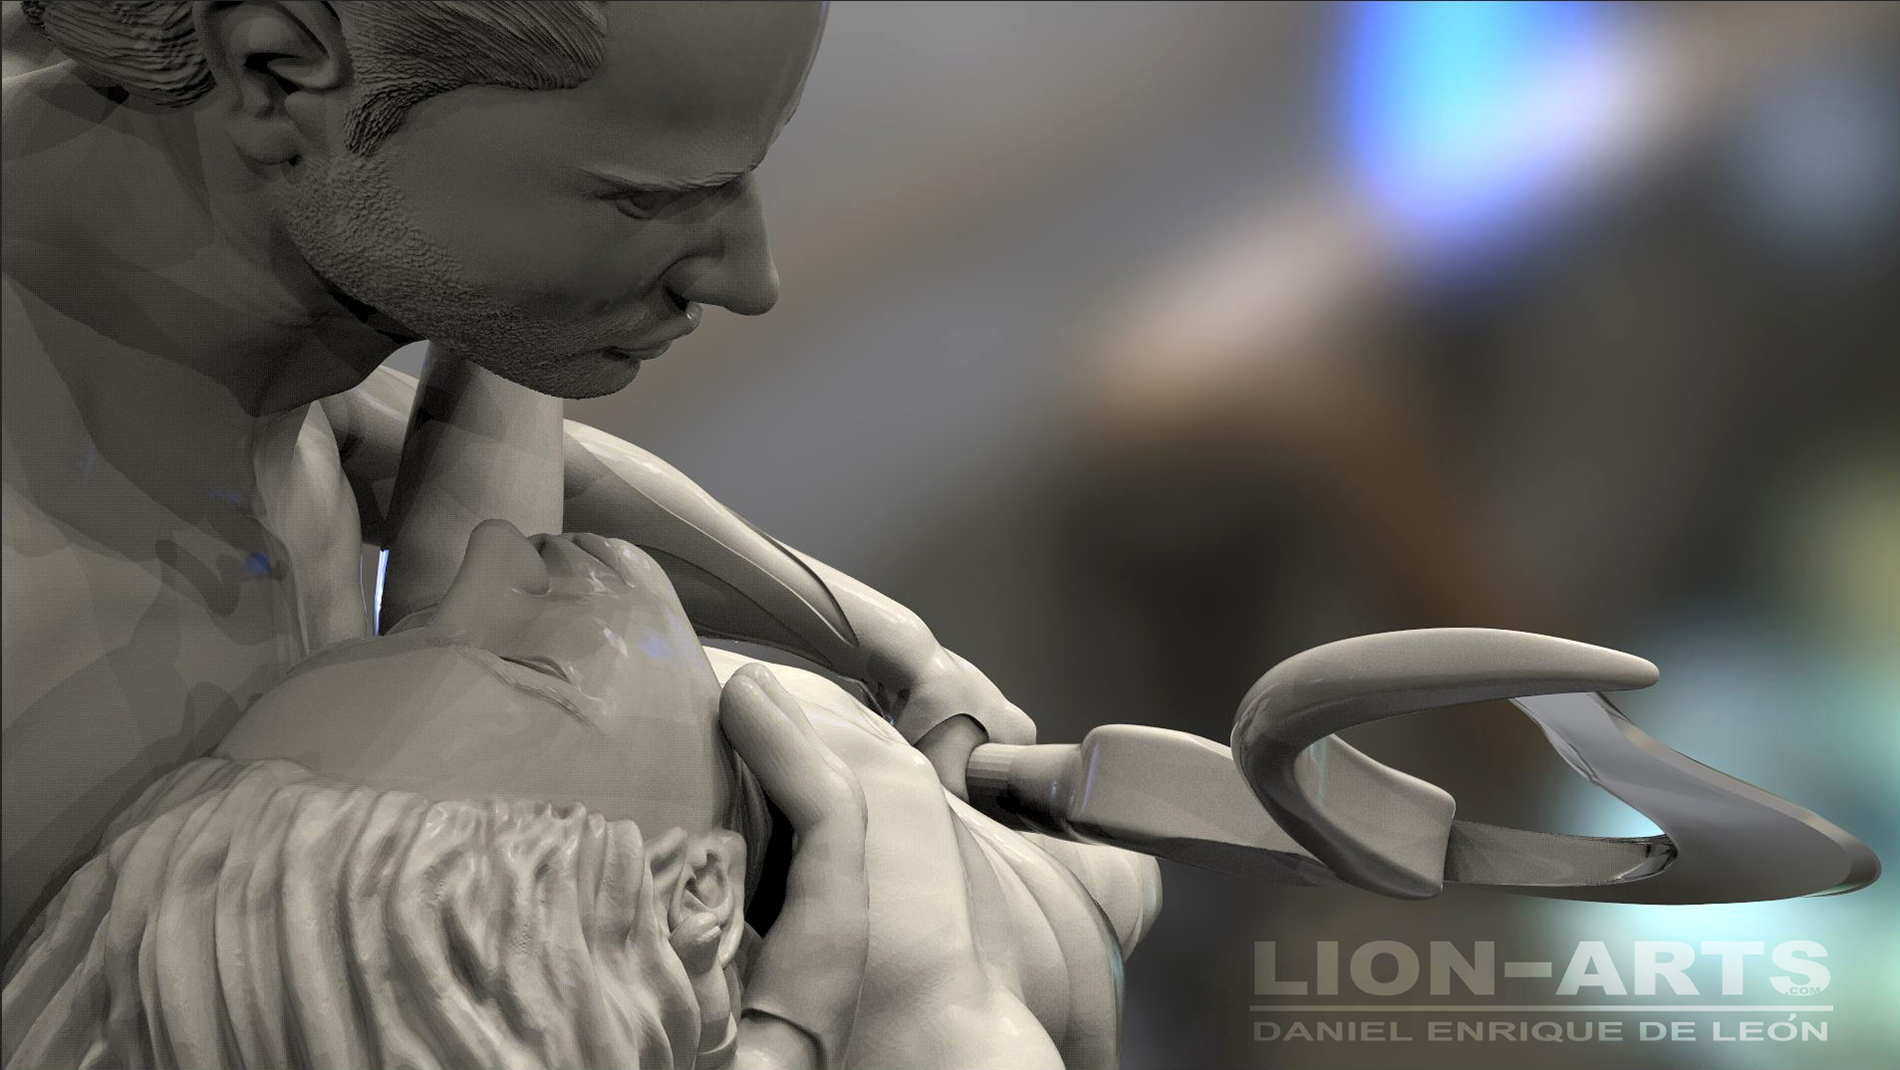 CupidPsyche_Lion-Arts-site-image4.jpg